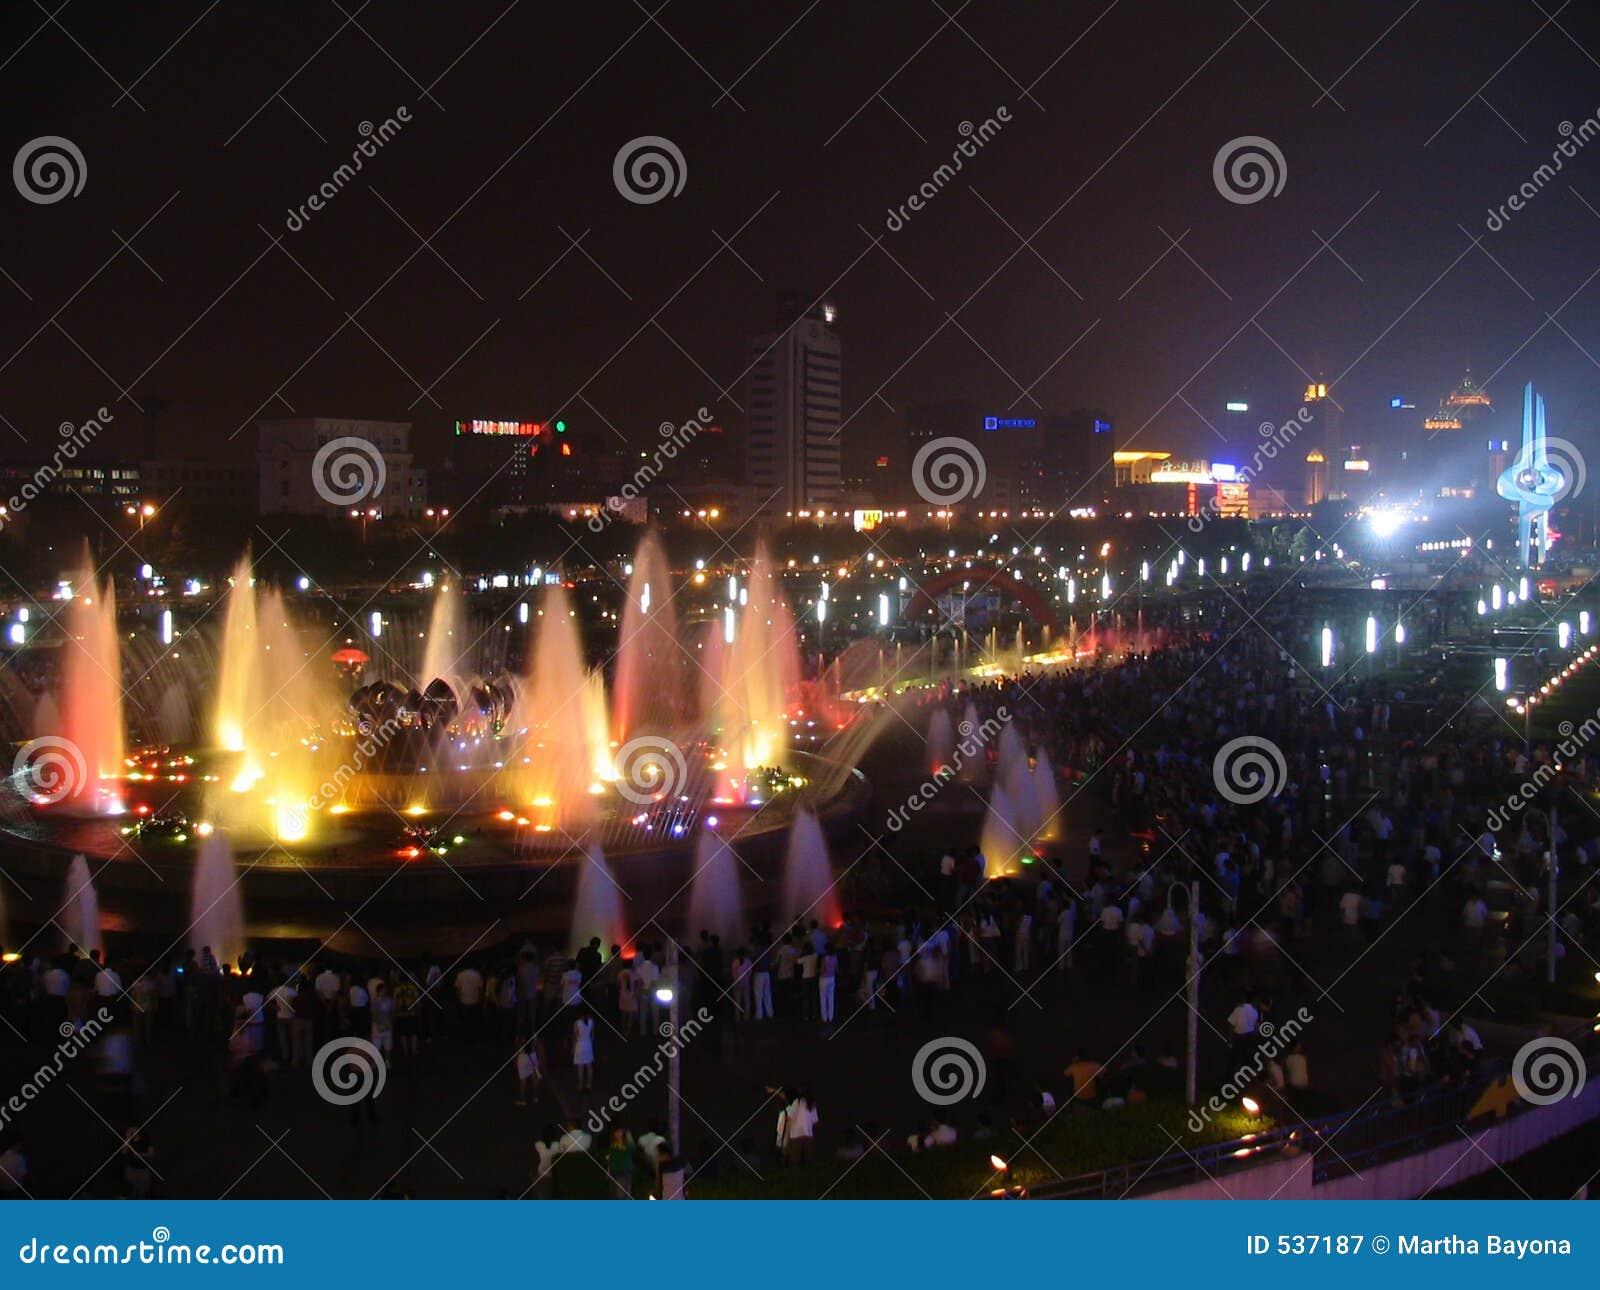 Download 好的水 库存图片. 图片 包括有 喷泉, 晚上, 潮湿, 仿效, 浸泡, 洪流 - 537187